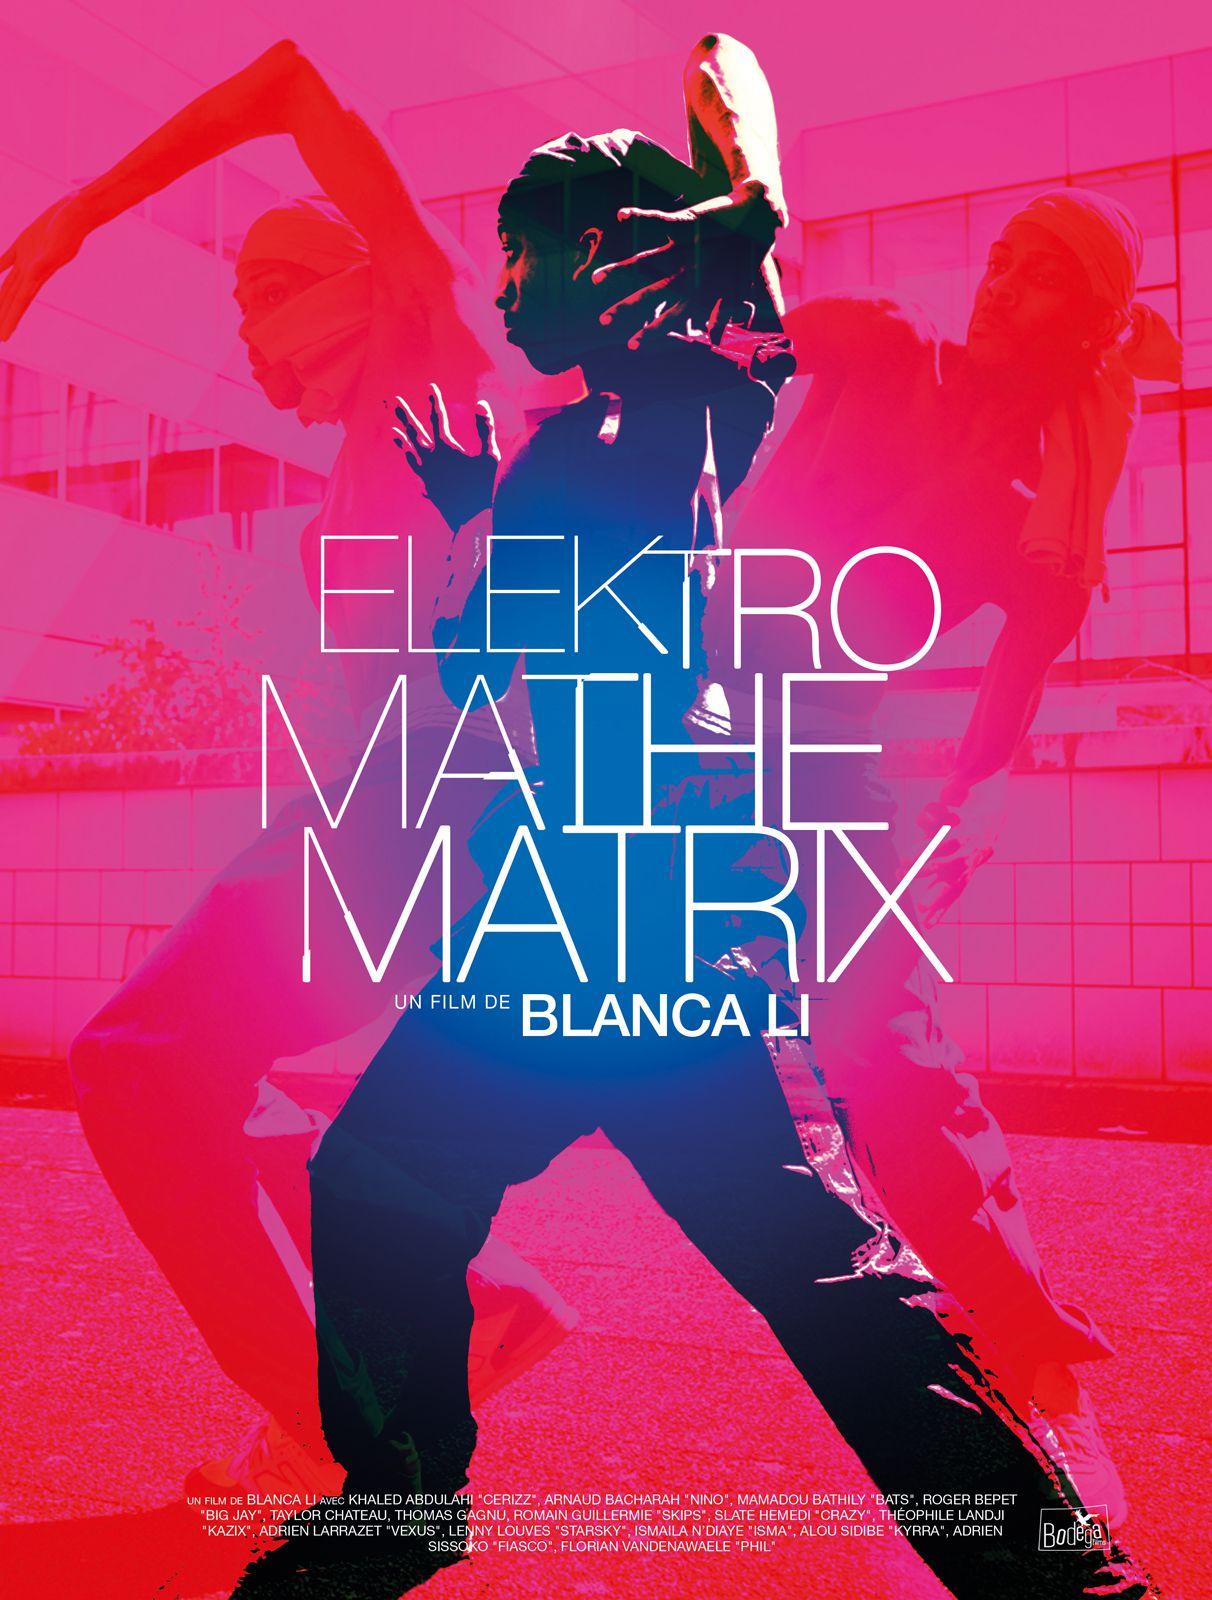 Elektro Mathematrix - Film (2016)